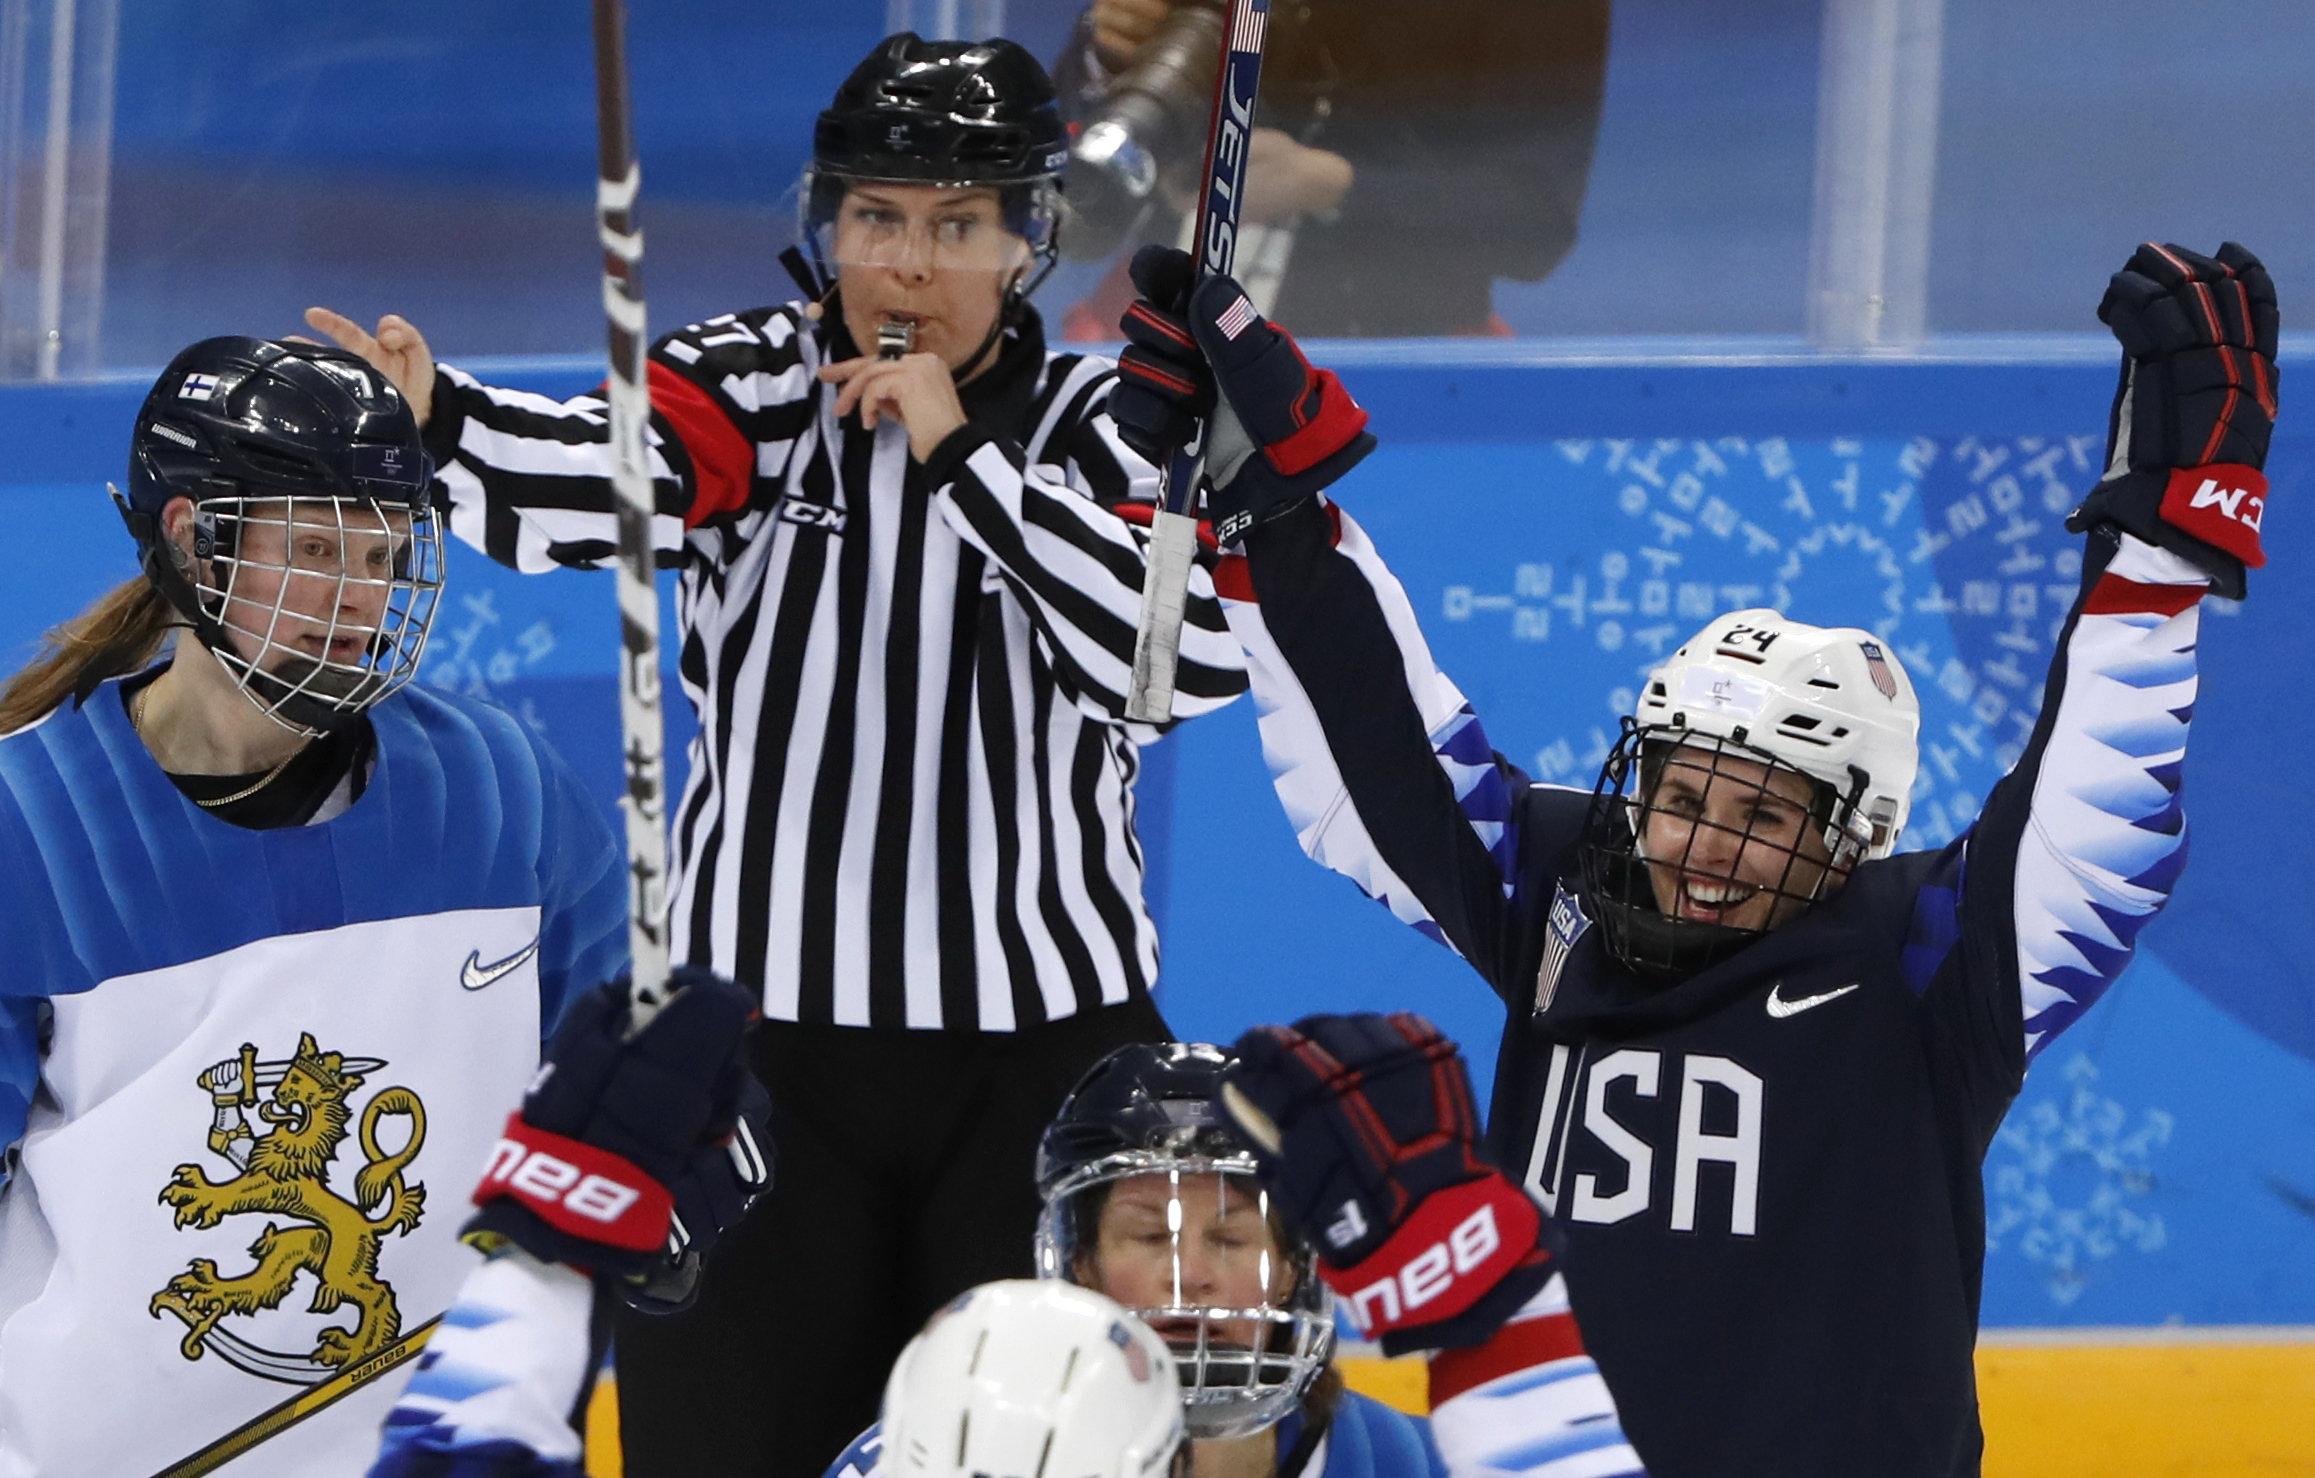 Danielle Cameranesi. right, of the U.S. celebrates scoringa goal against Finlandduring the women's ice hockey sem